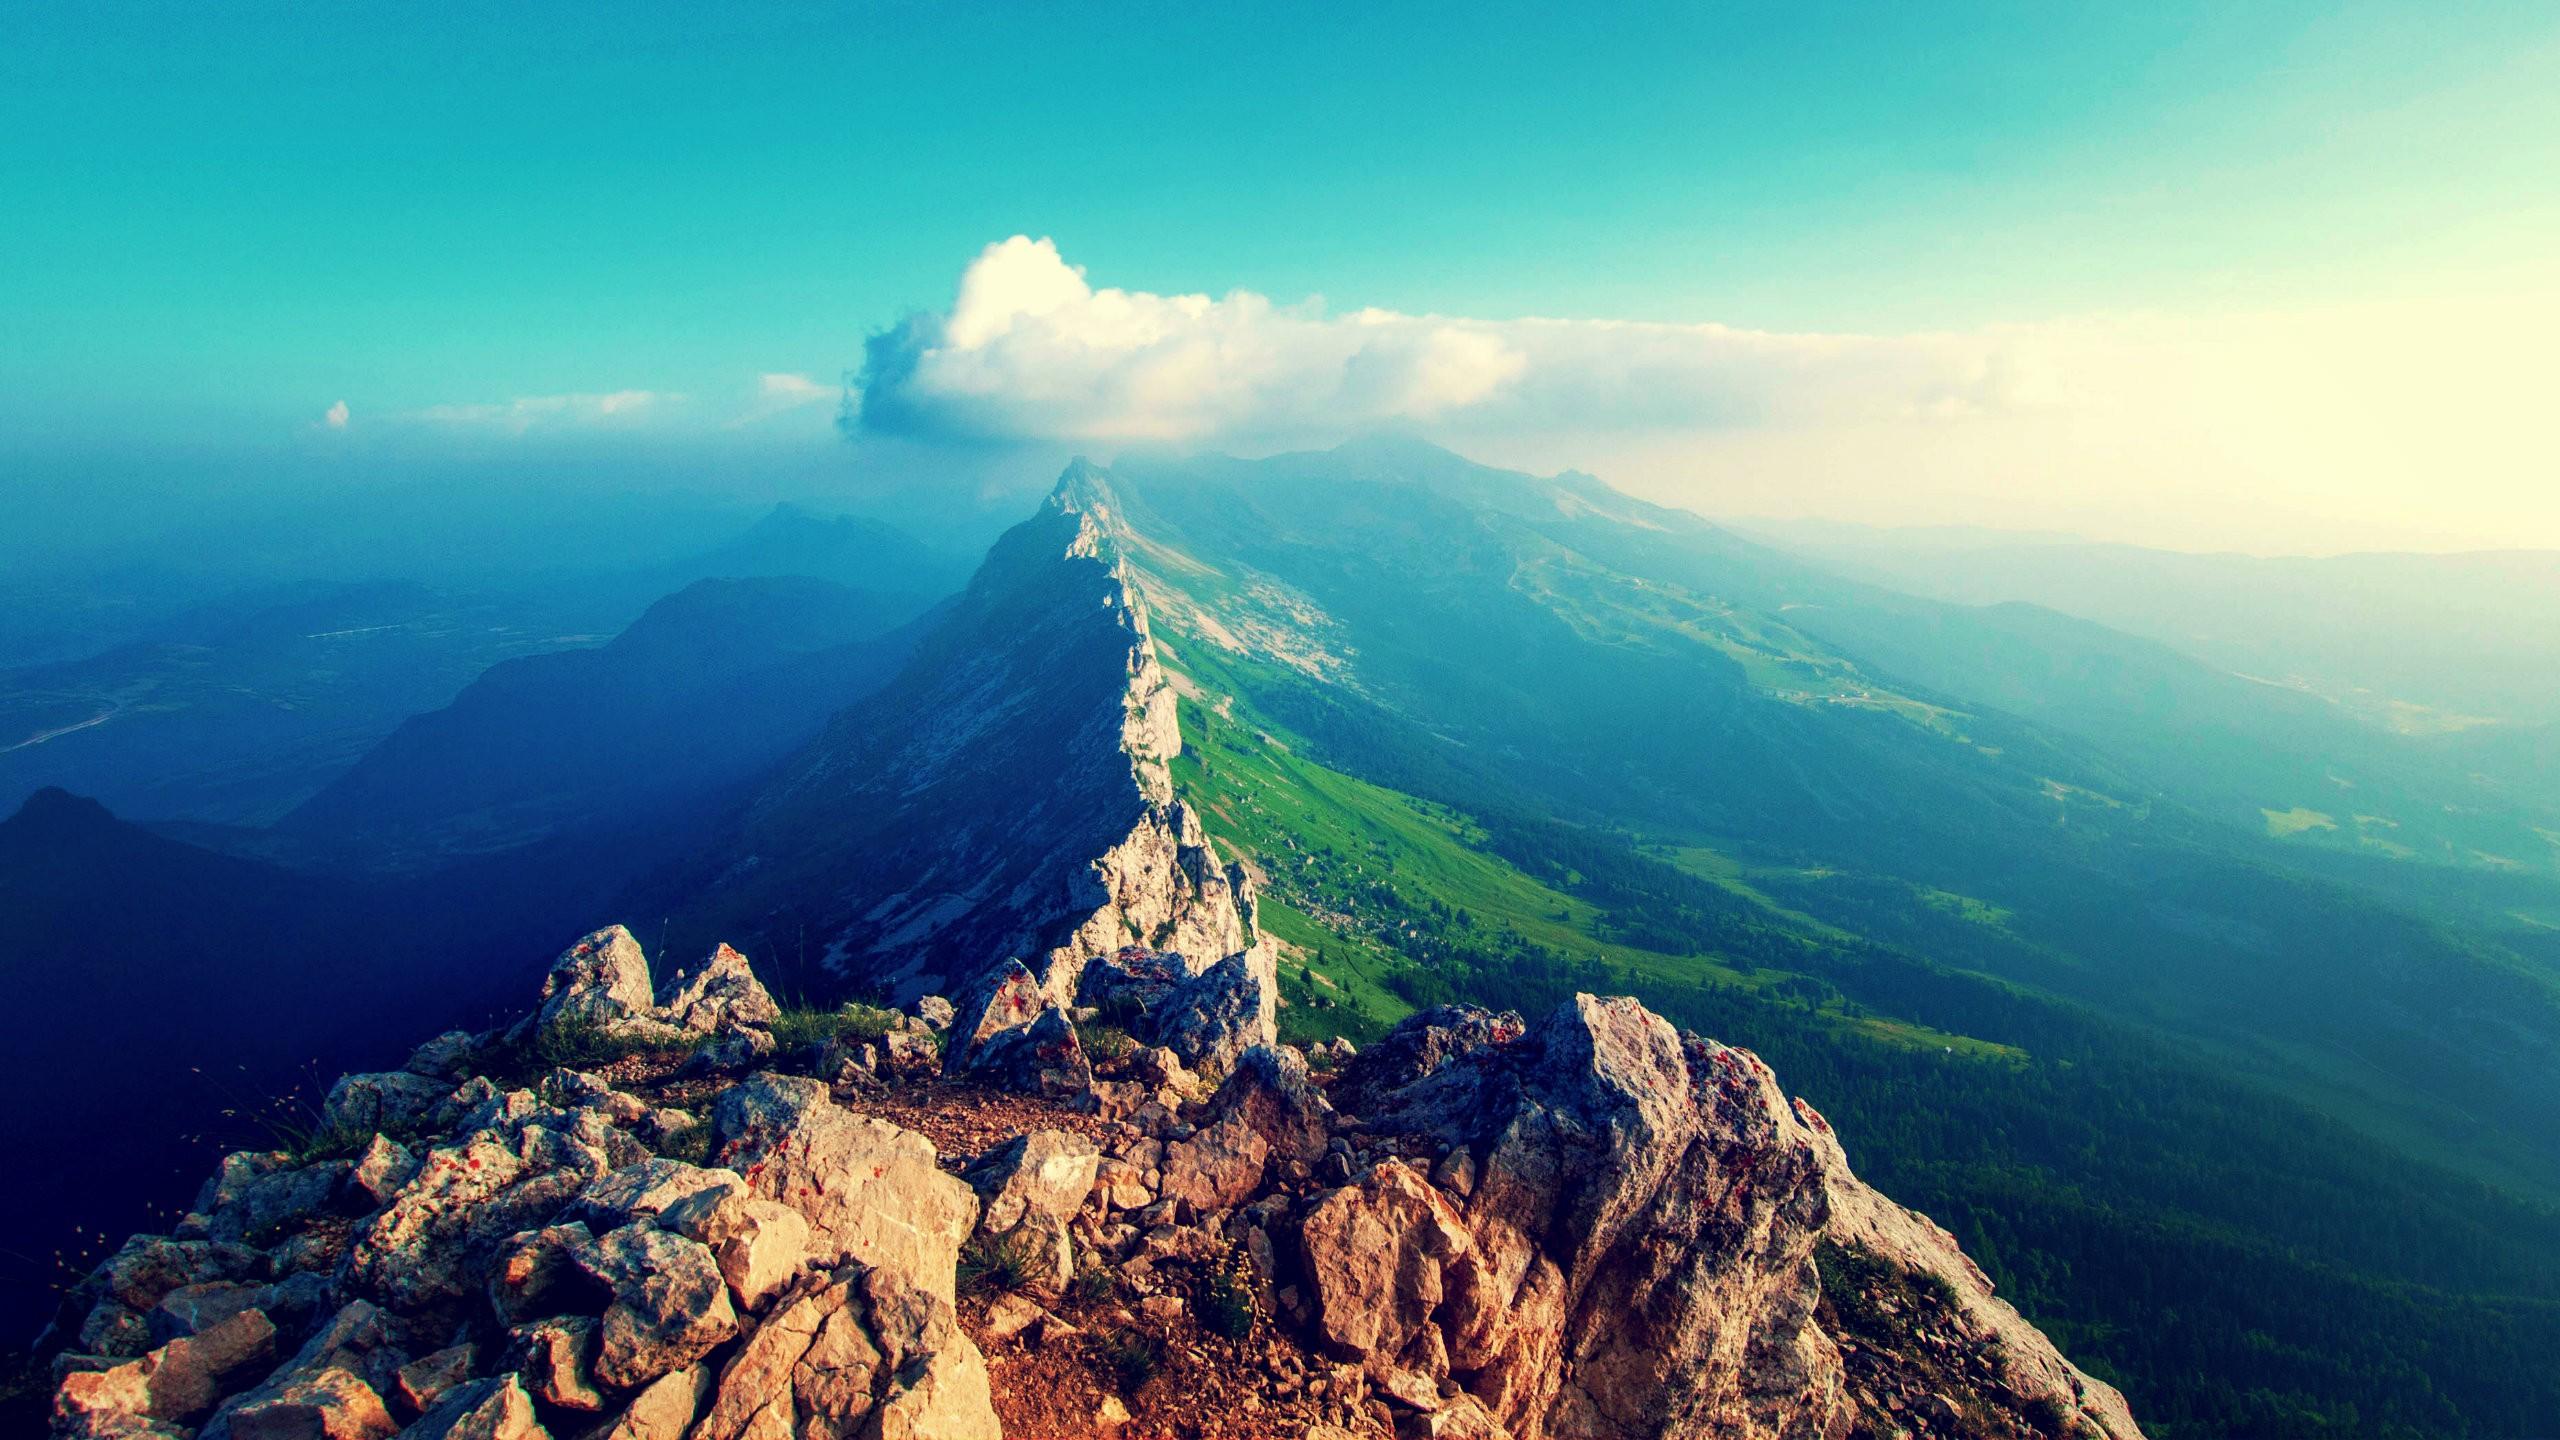 Fondos para android especial landscapes paisajes adnfriki for Fondos de pantalla para android gratis